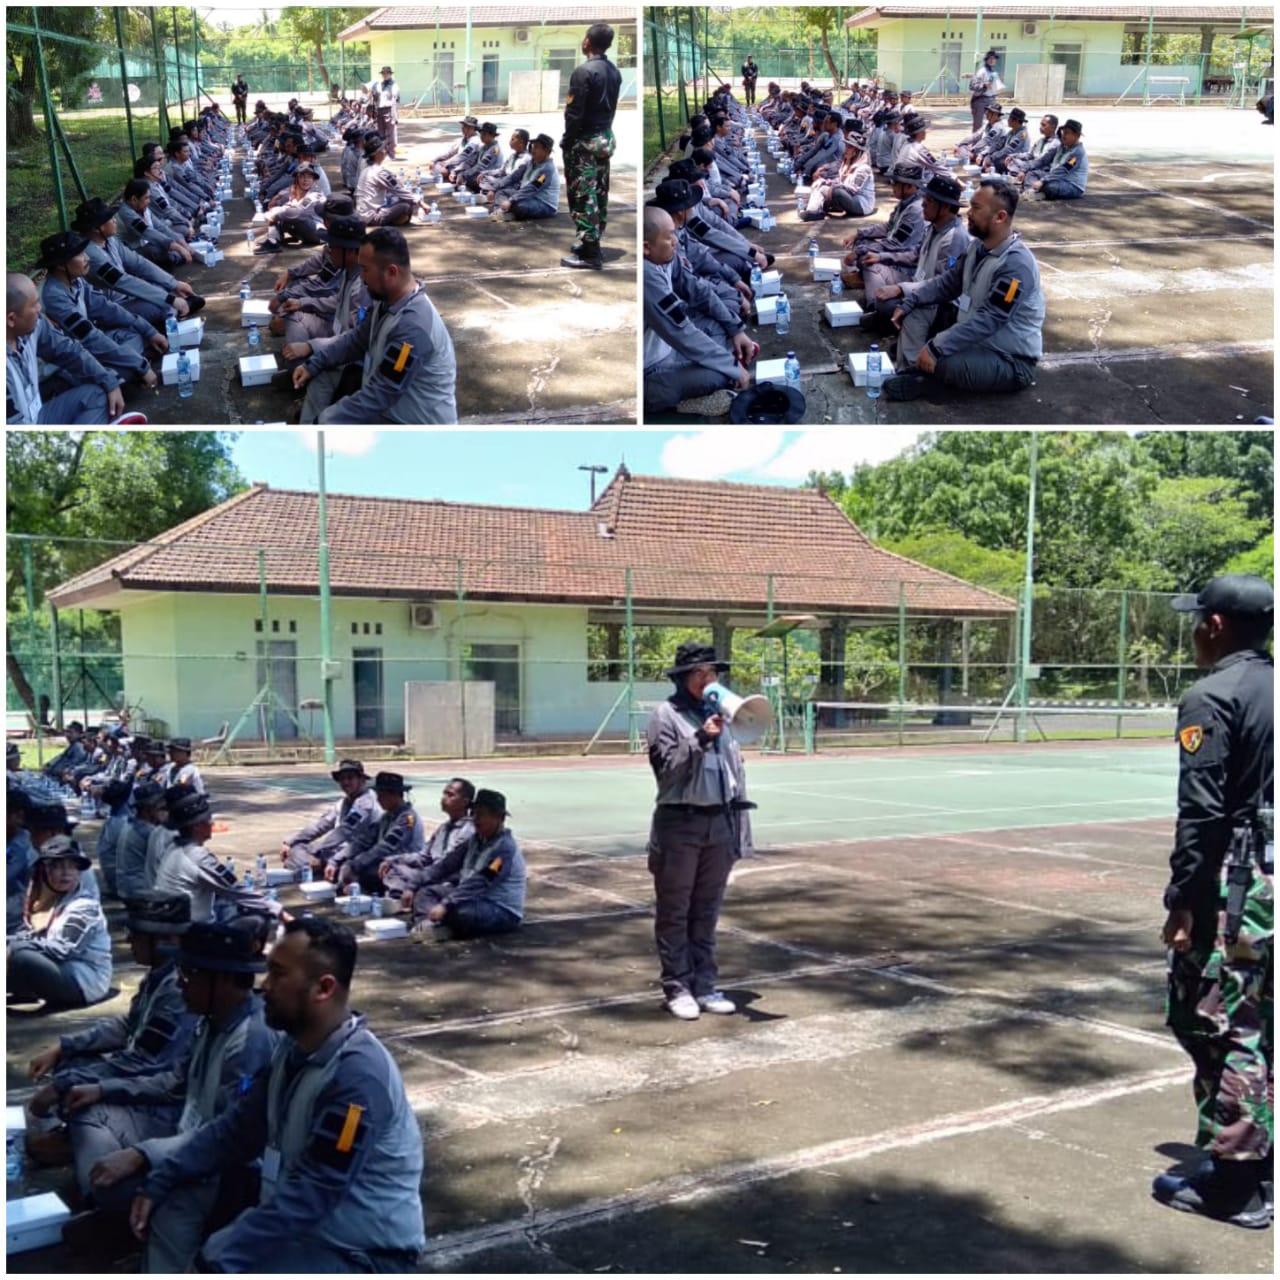 Makan siang bersama, berbaris dengan rapih, lapor pelatih, berdoa, makan di ksatrian Grup 1 Kopassus